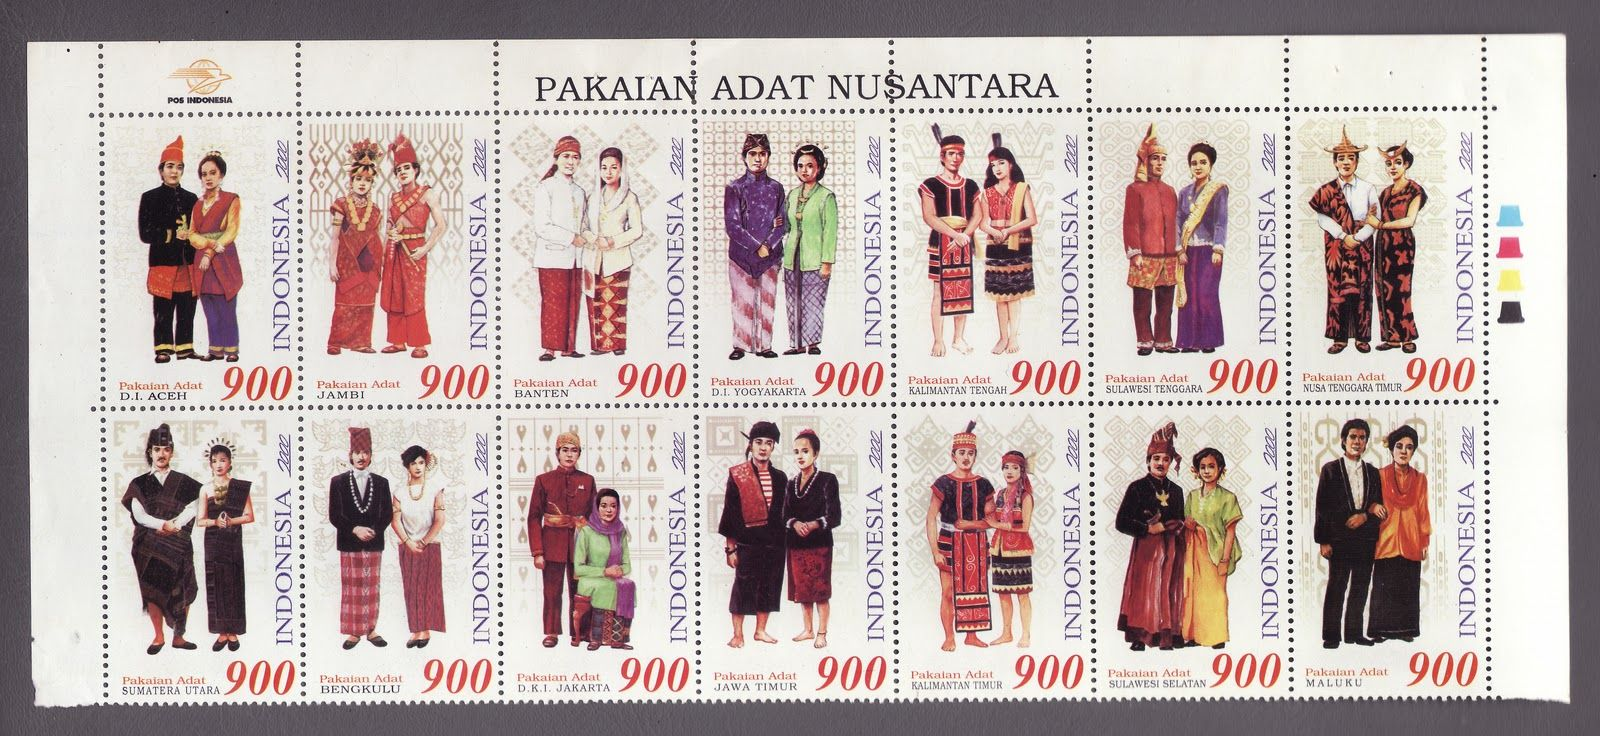 34 Provinsi Pakaian Adat Indonesia